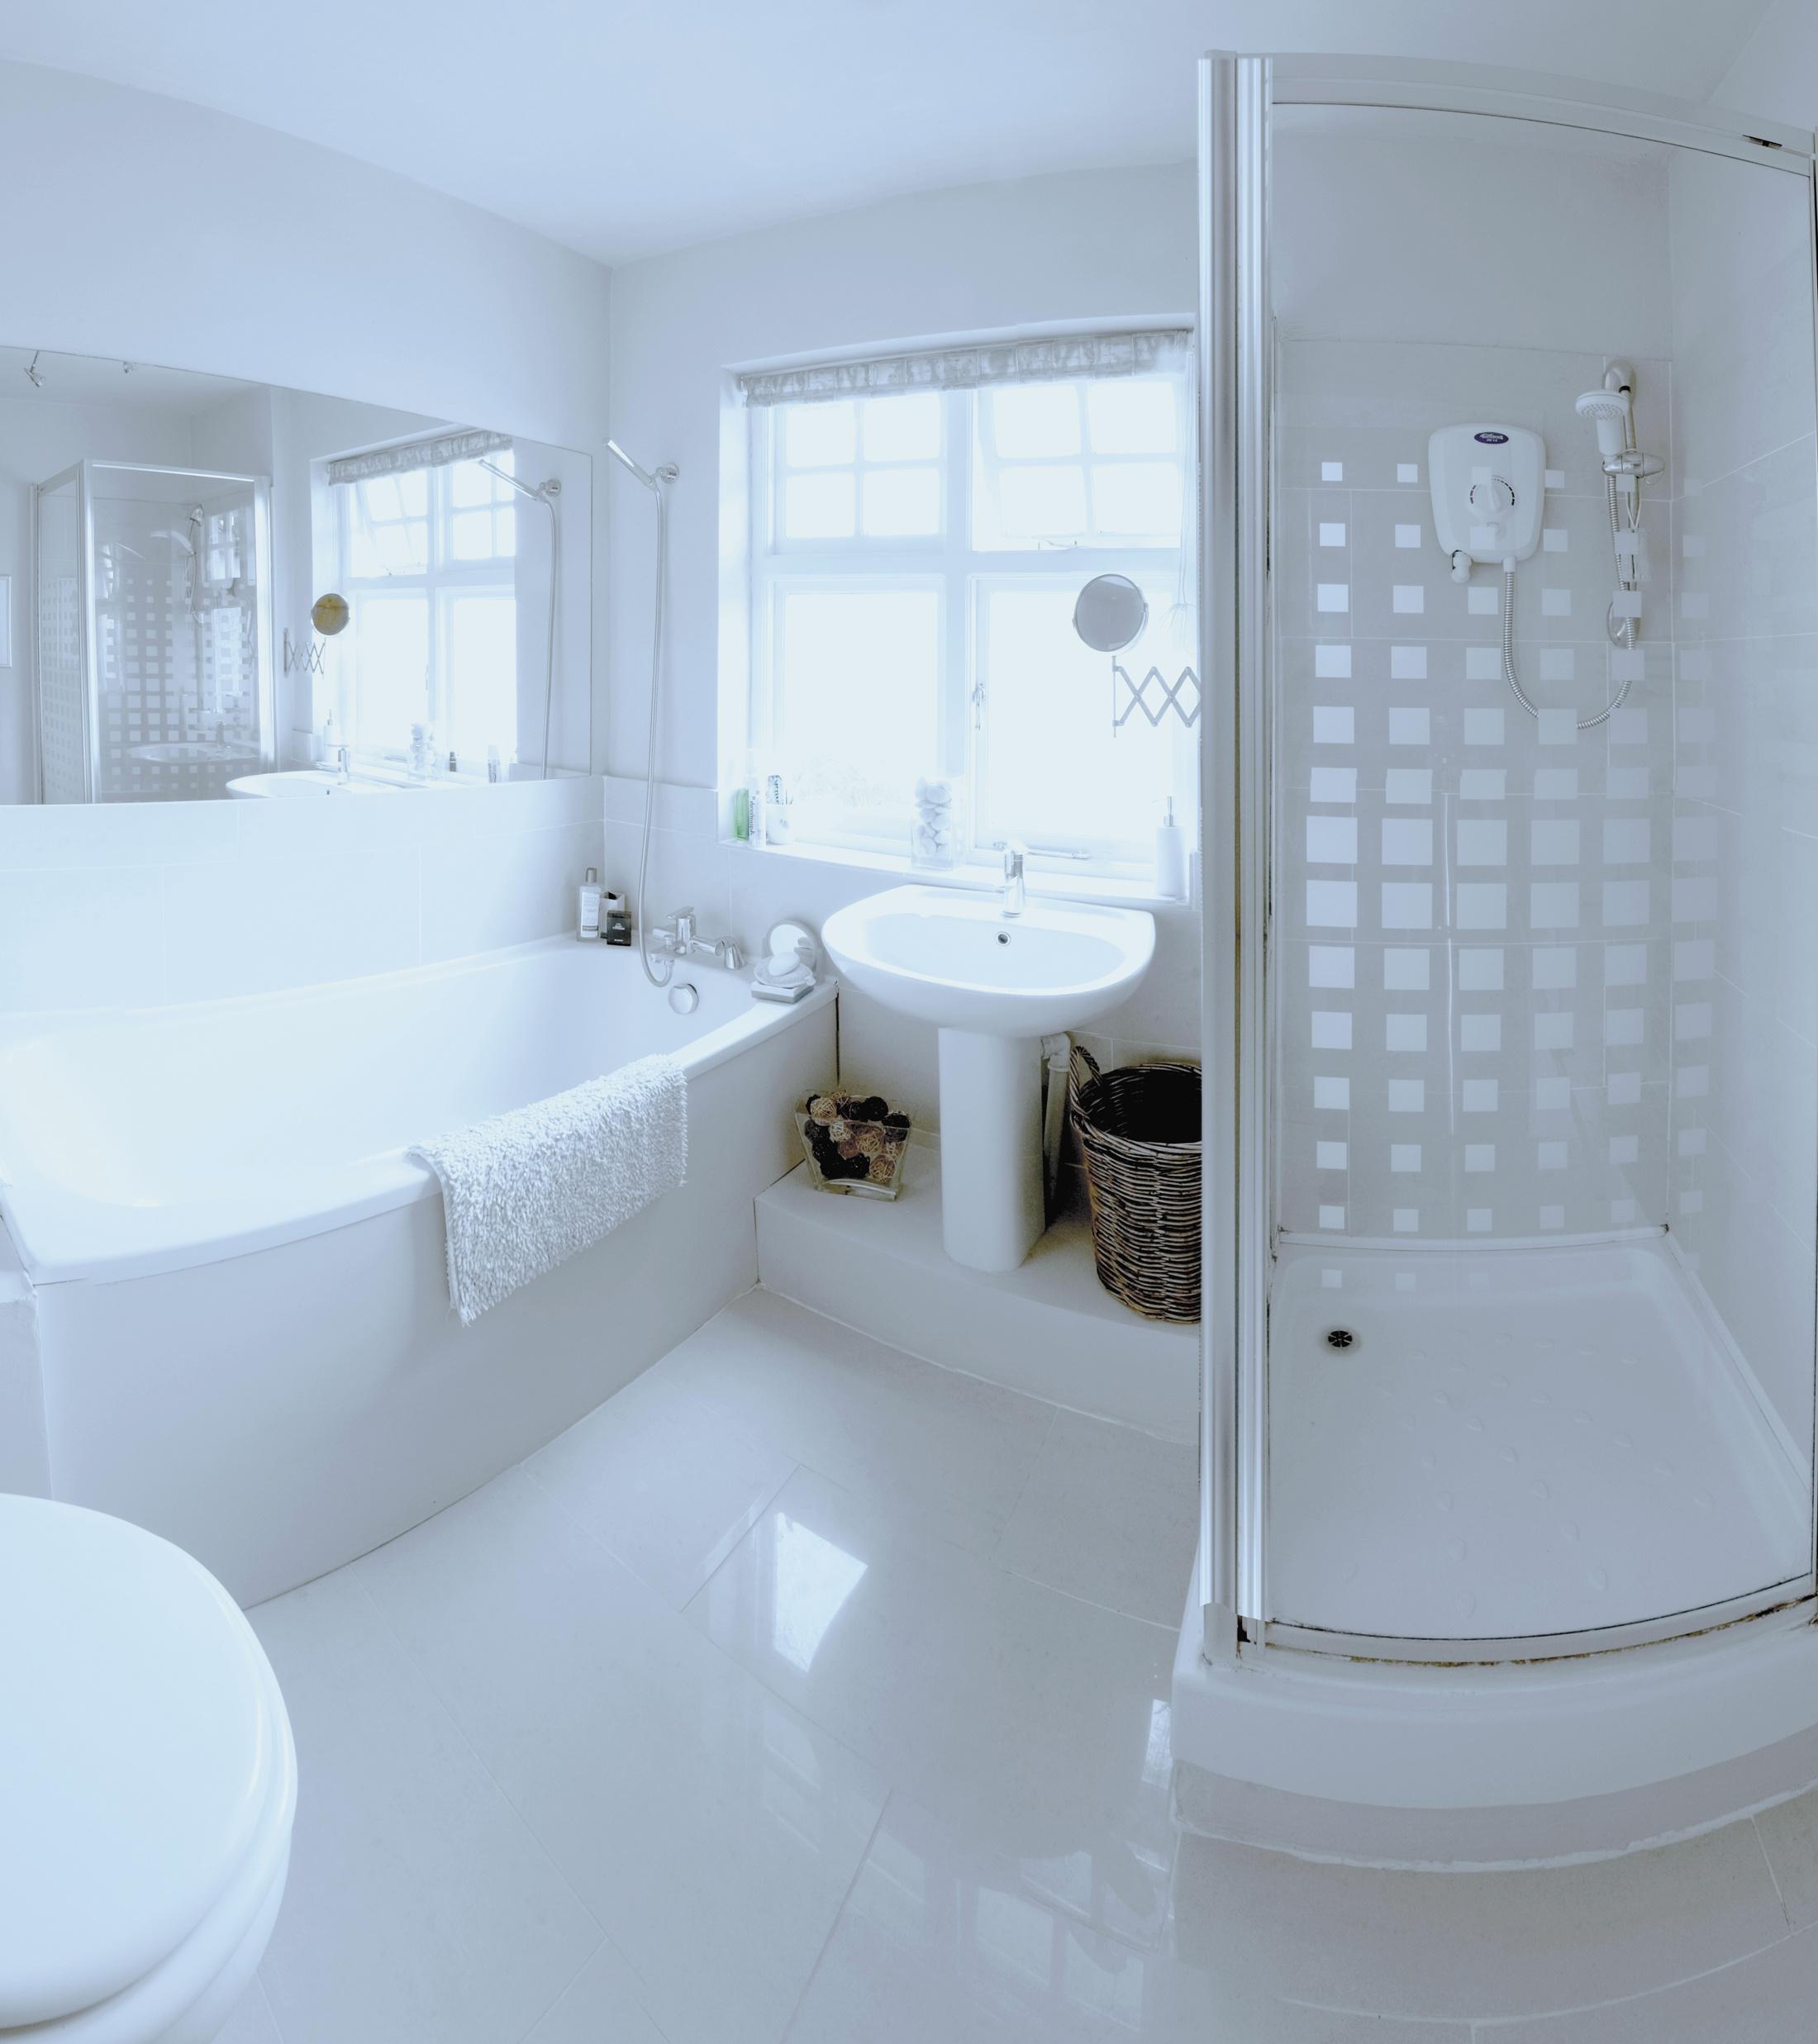 Grip Anti slip for bathroom 5 m2 - Haagh Protection